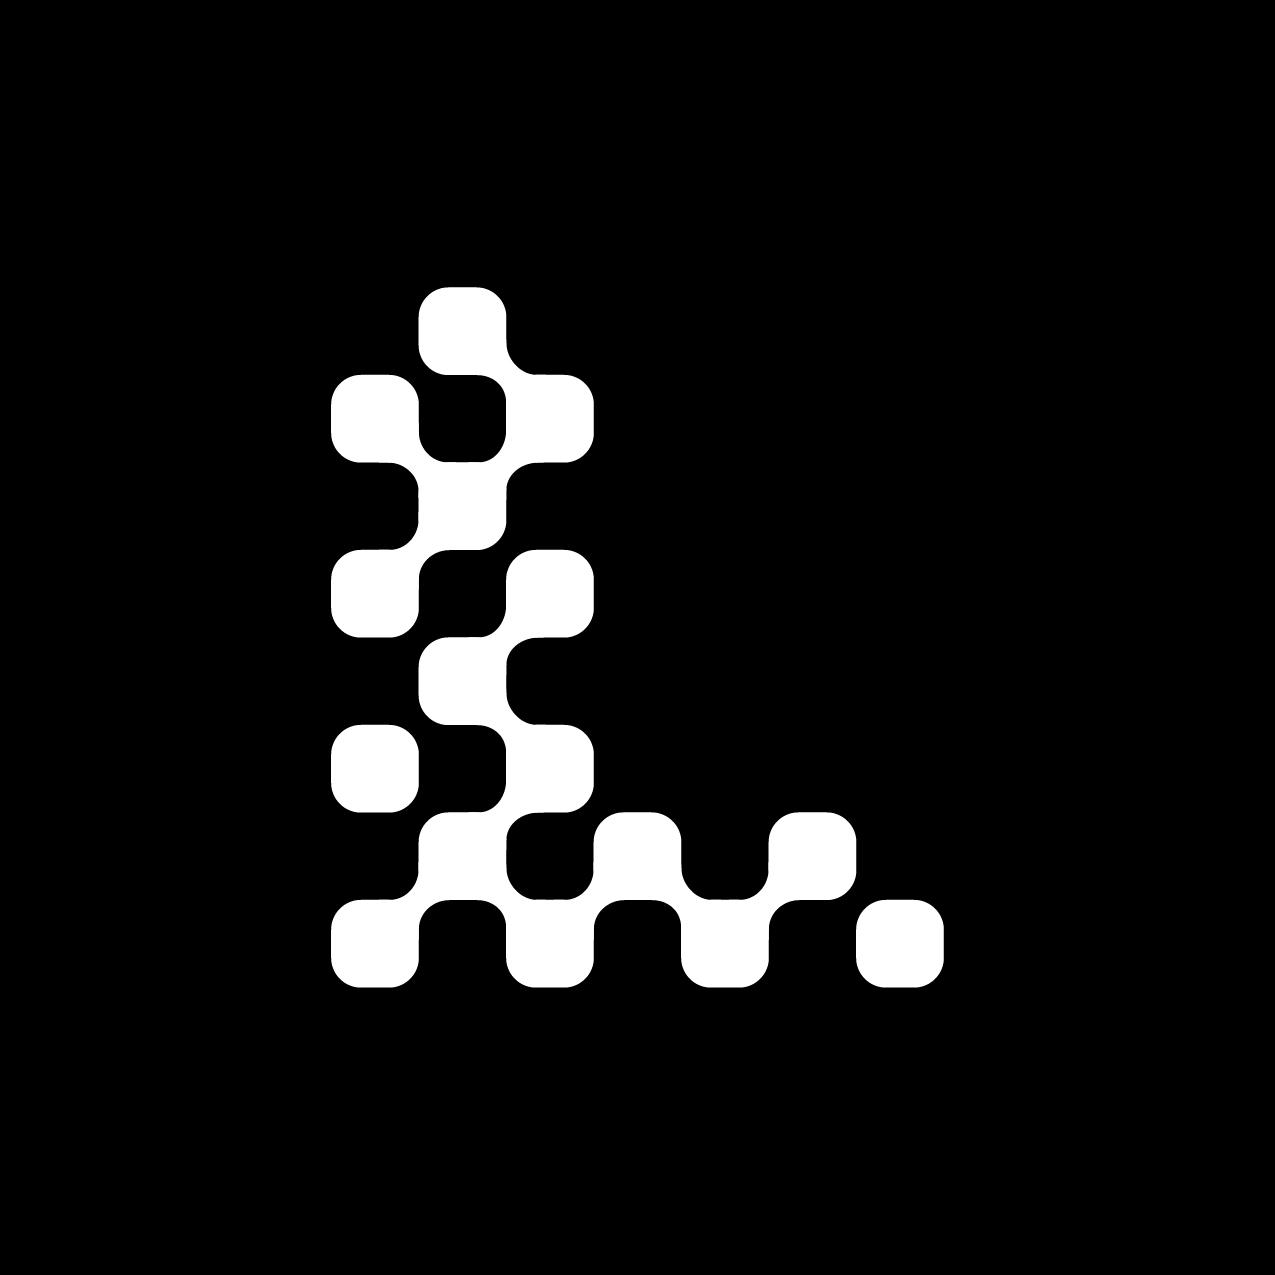 Letter L4 Design by Furia